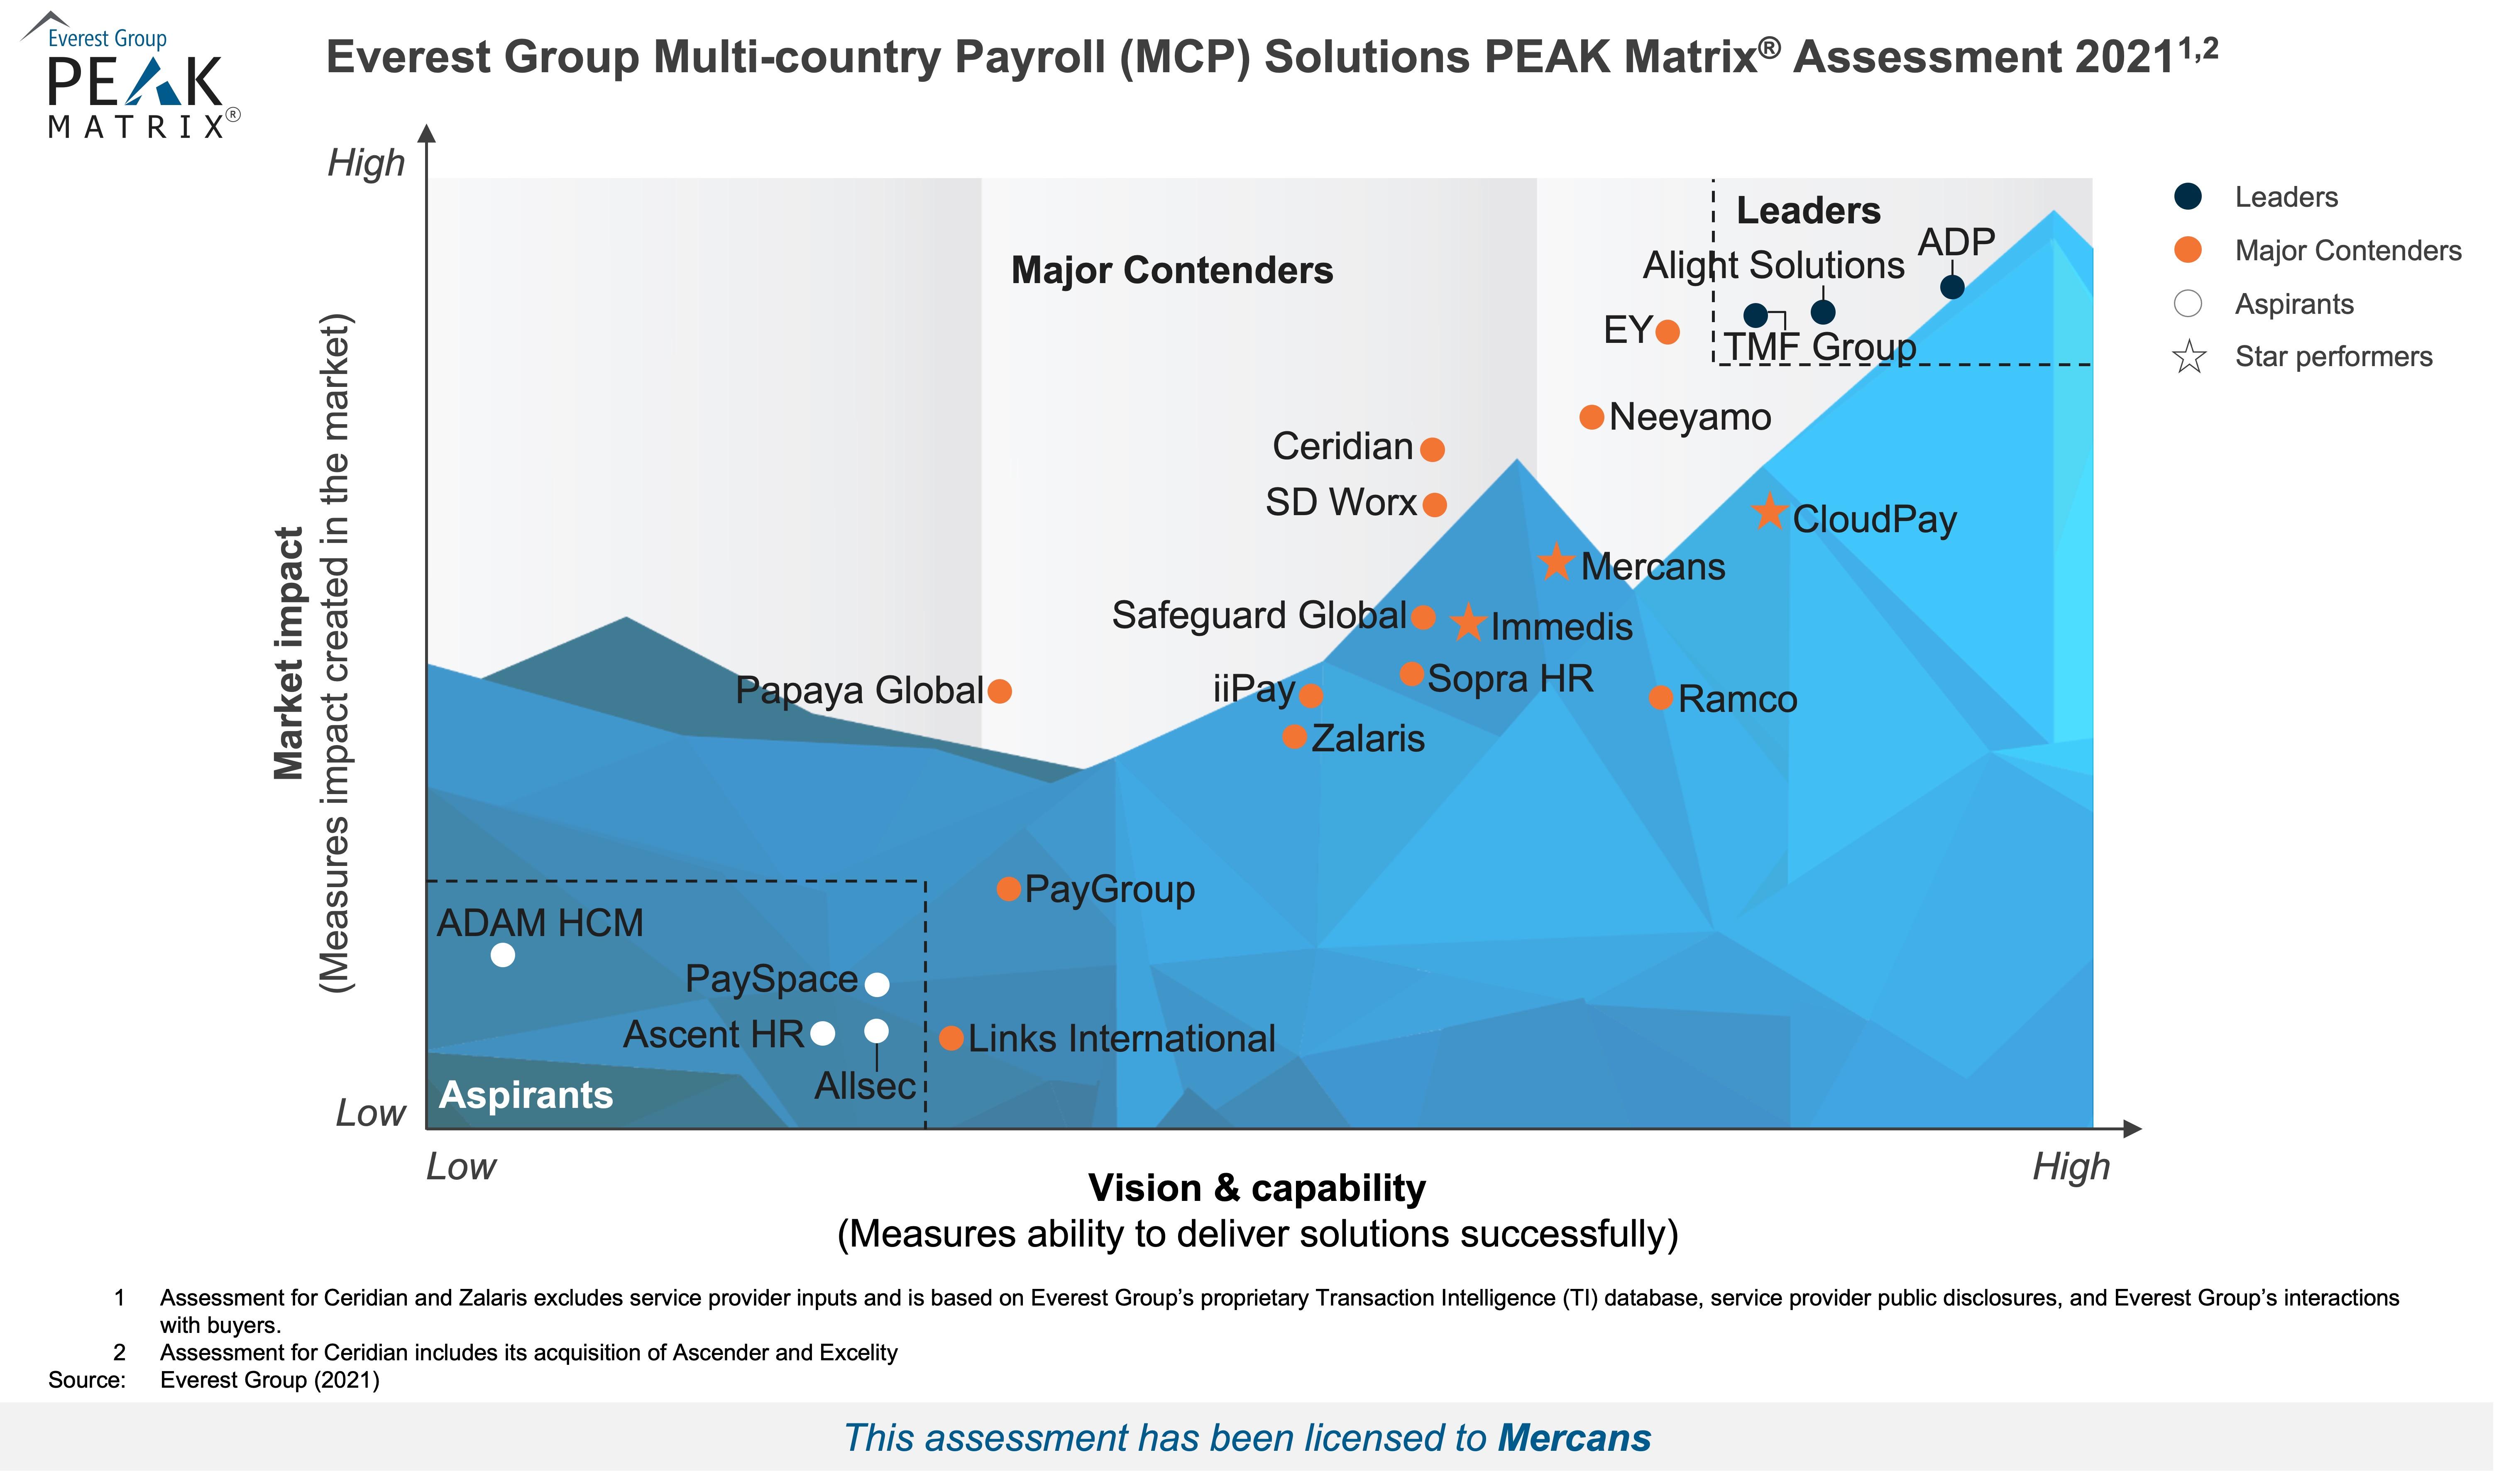 Mercans on MCP Peak Matrix